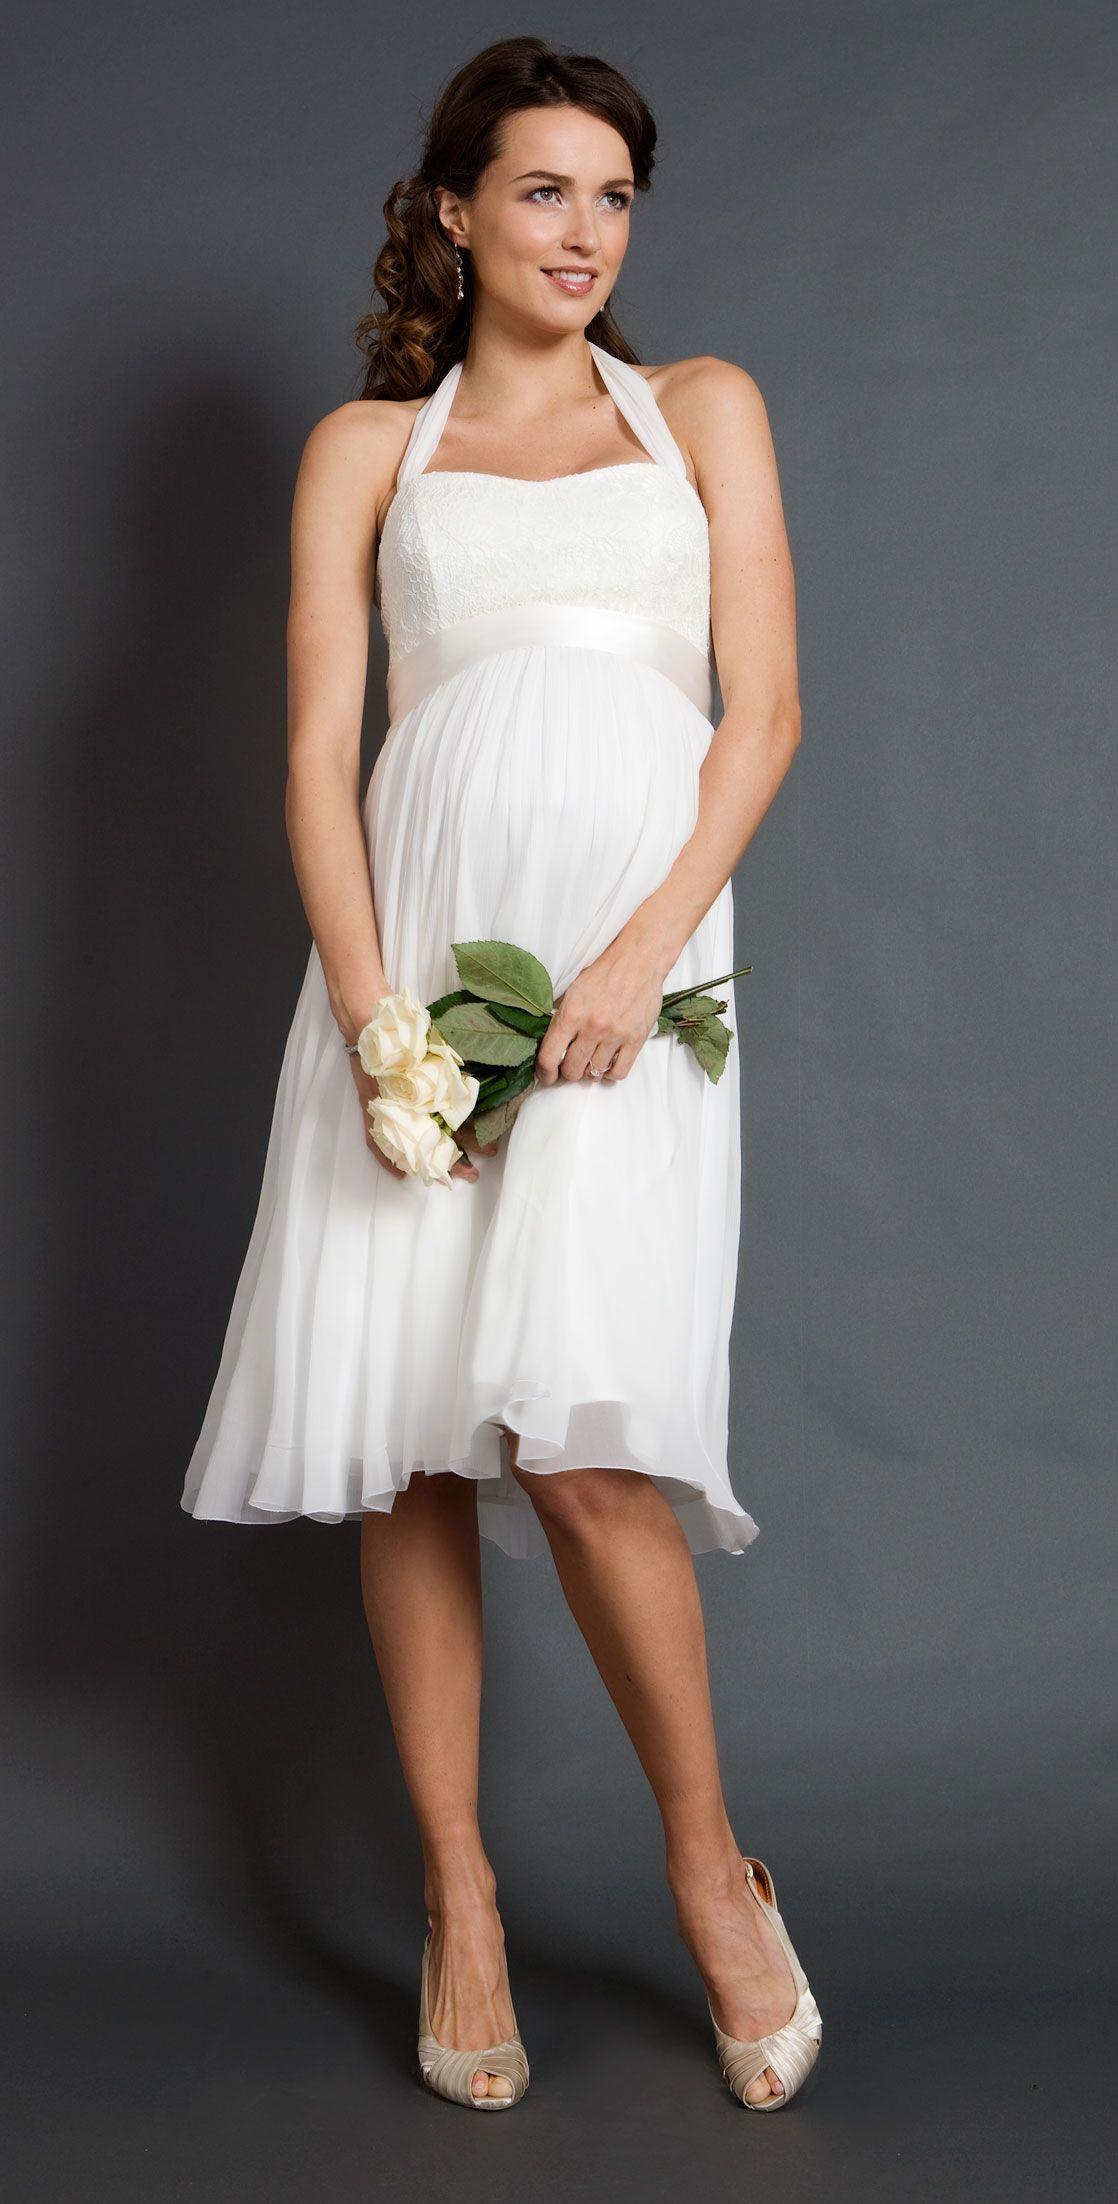 Short wedding dresses wedding dress short lace wedding dress short wedding dresses ombrellifo Image collections